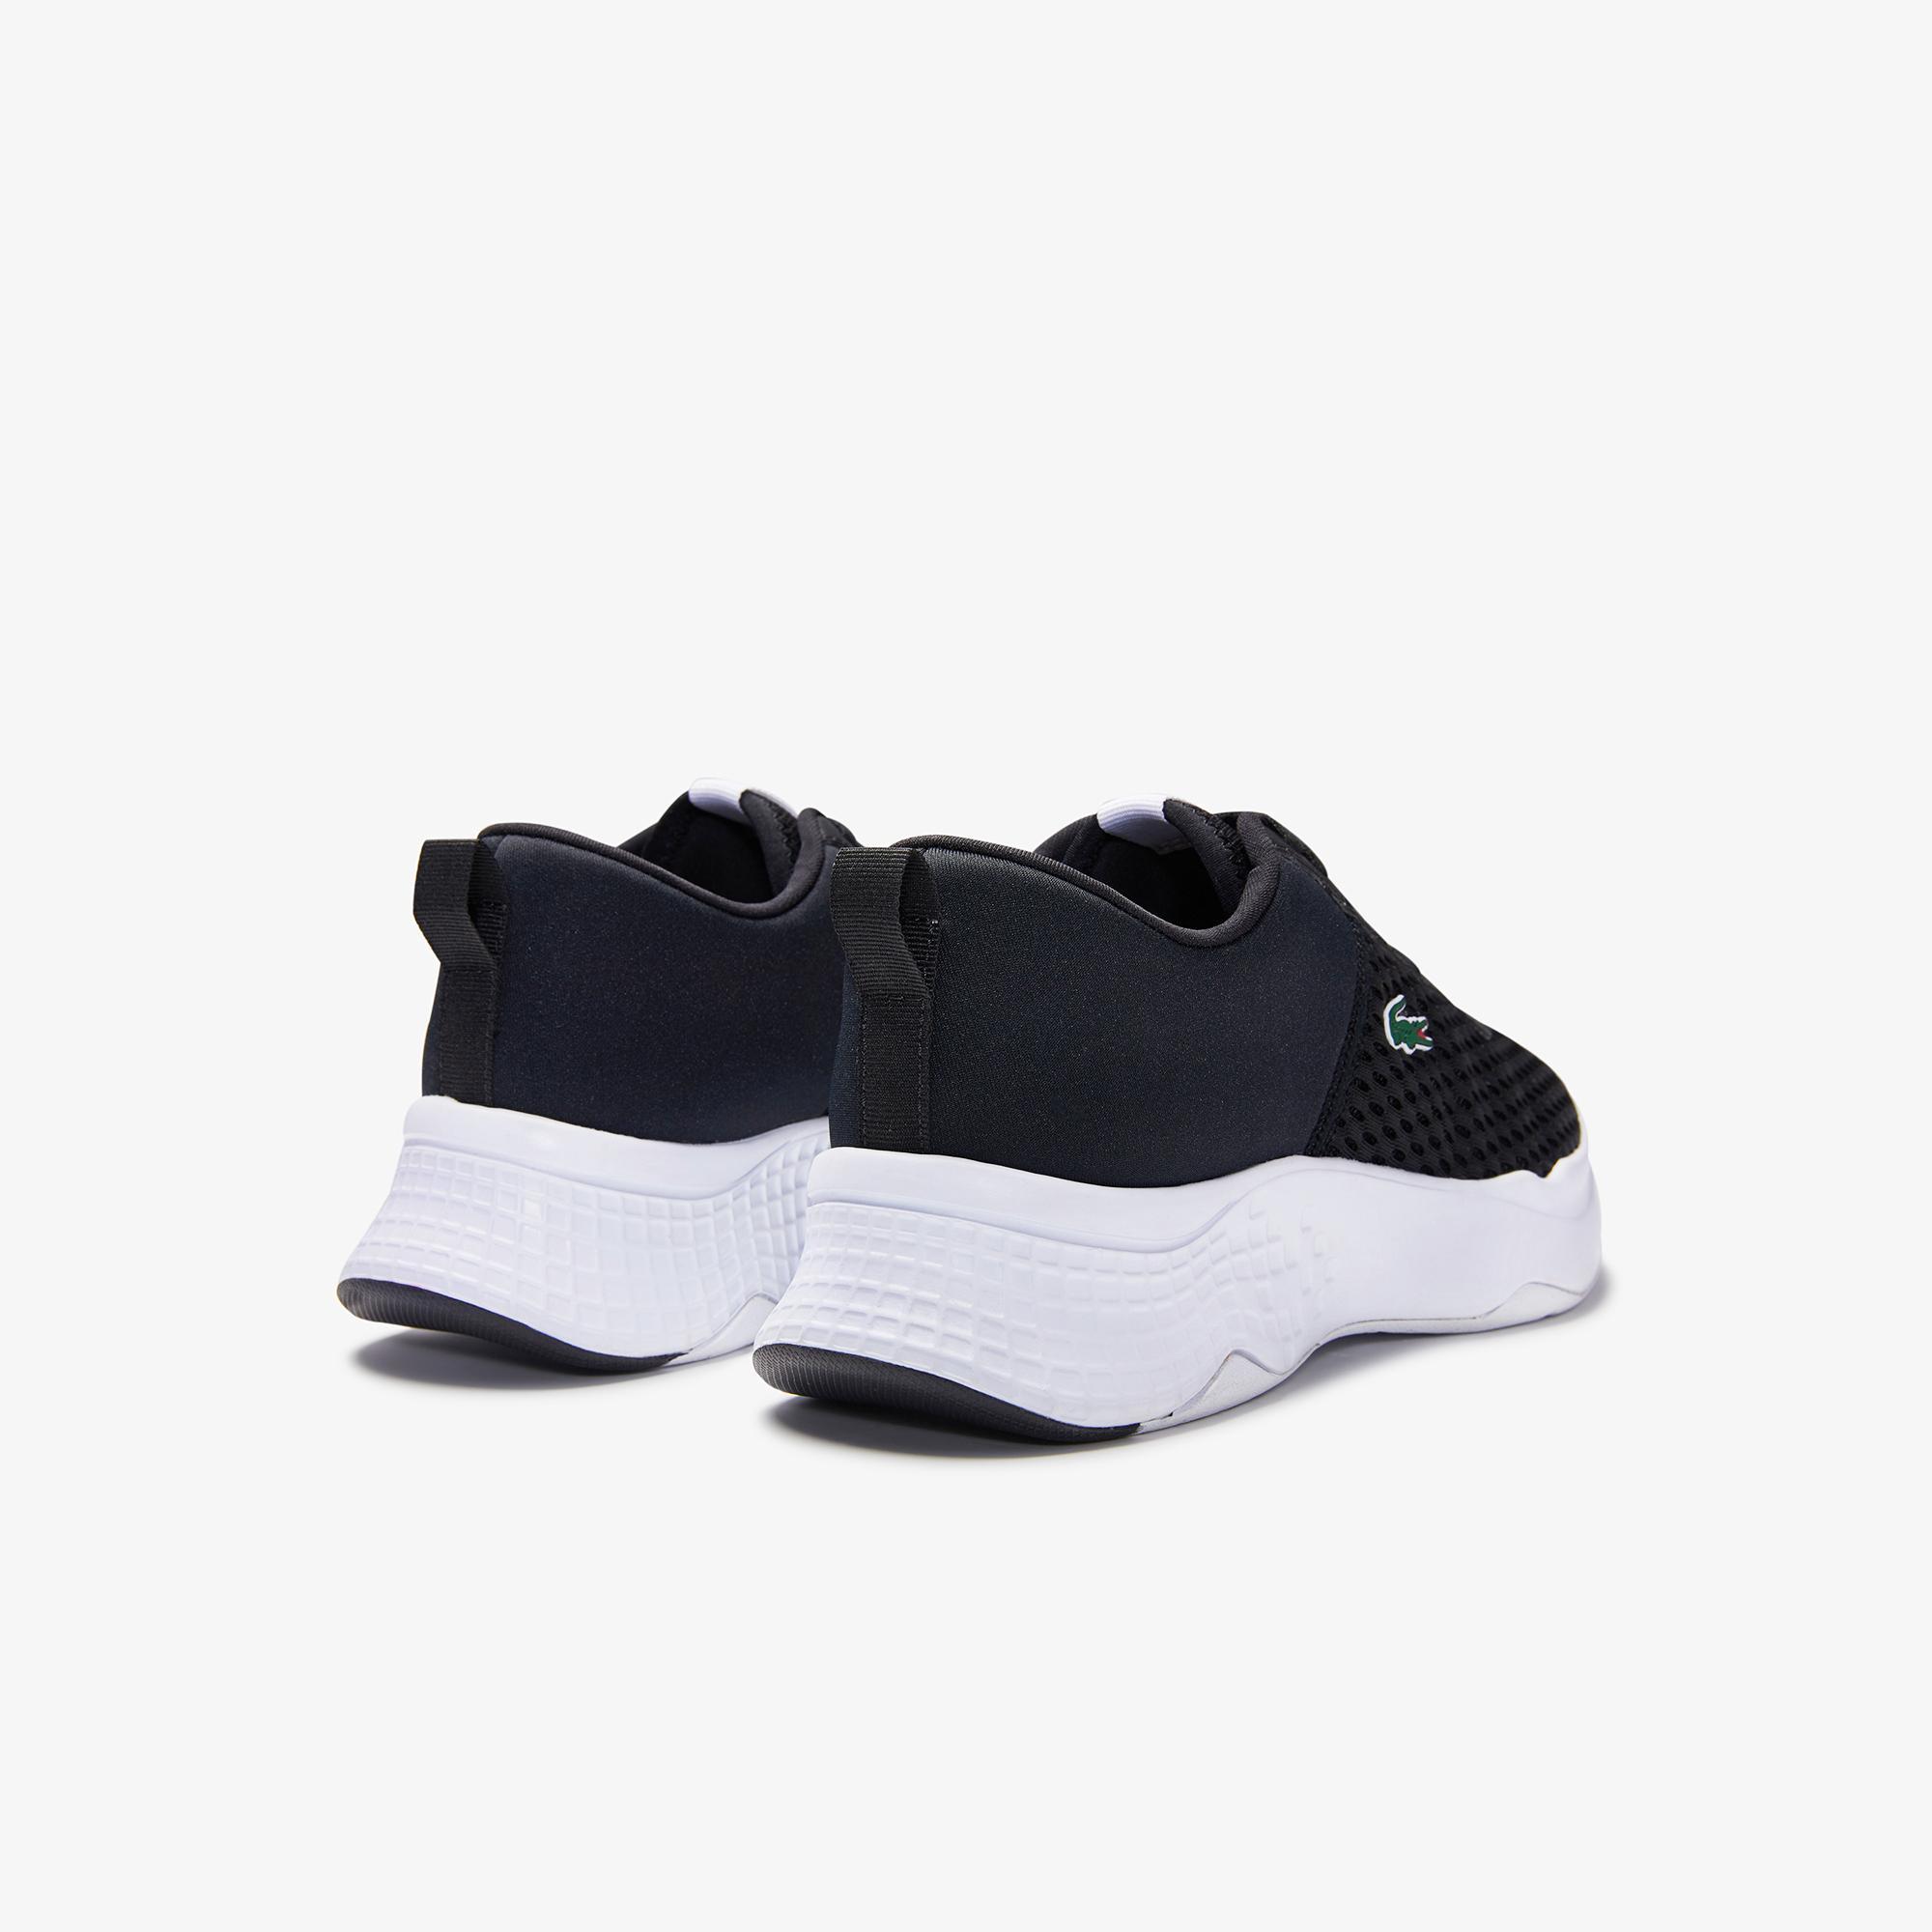 Lacoste Court-Drive 0120 1 Suj Blk/Wht Kadın Siyah - Beyaz Sneaker